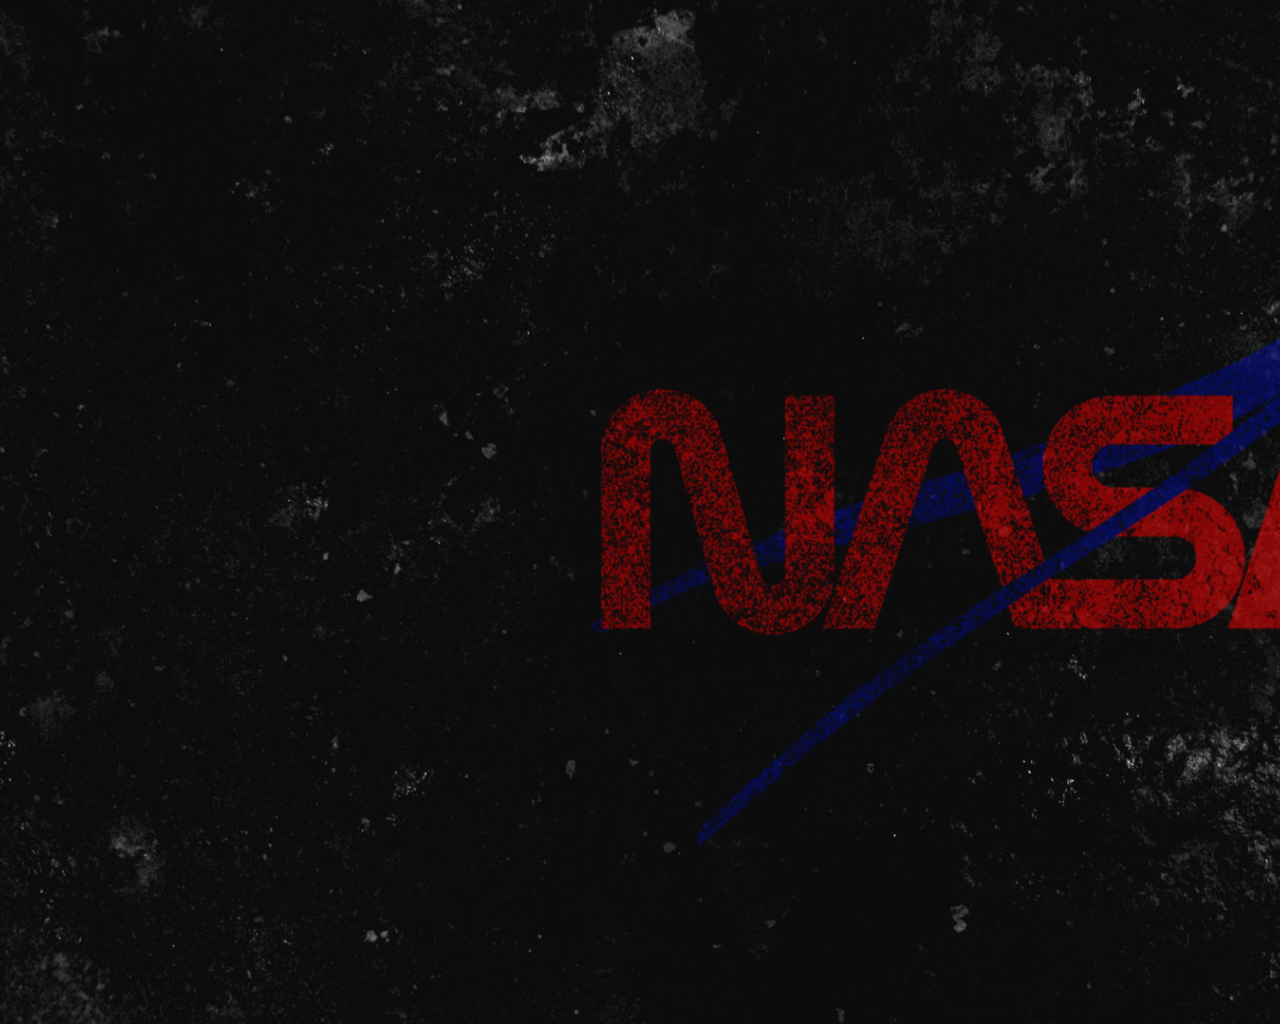 nasa desktop logo - HD1280×1024